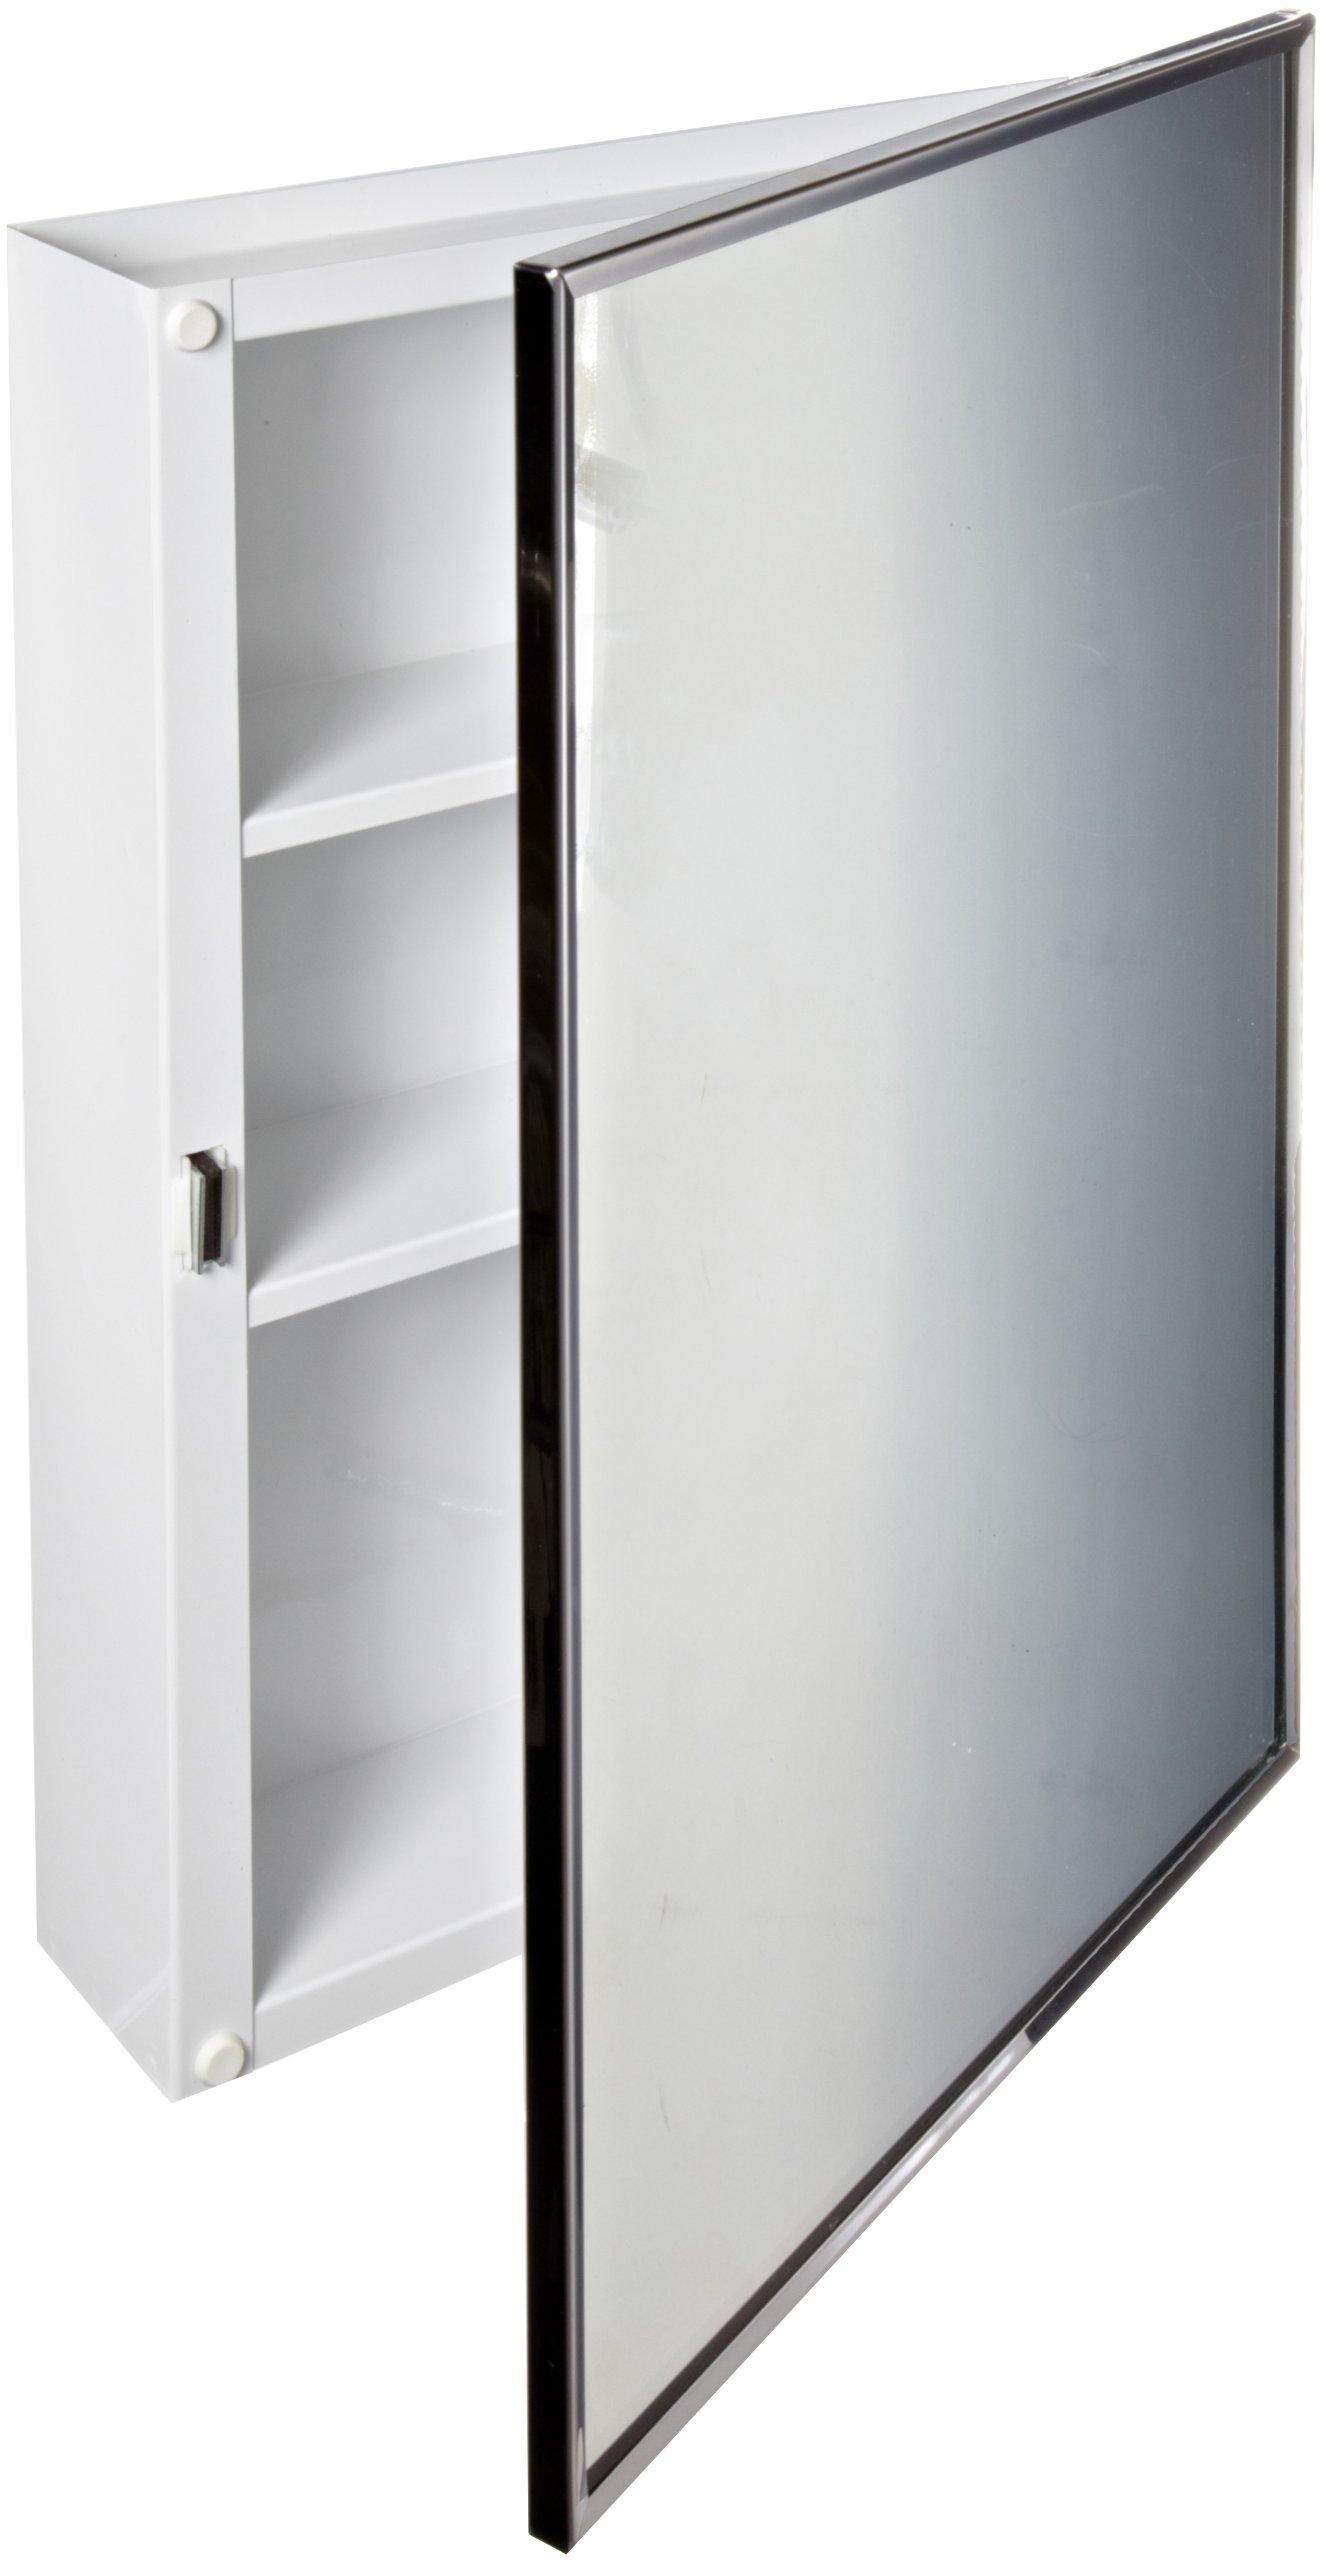 Bobrick 297 Steel Surface-Mounted Medicine Cabinet, Baked White Enamel Finish, 3-3/4'' Depth, 2 Shelves